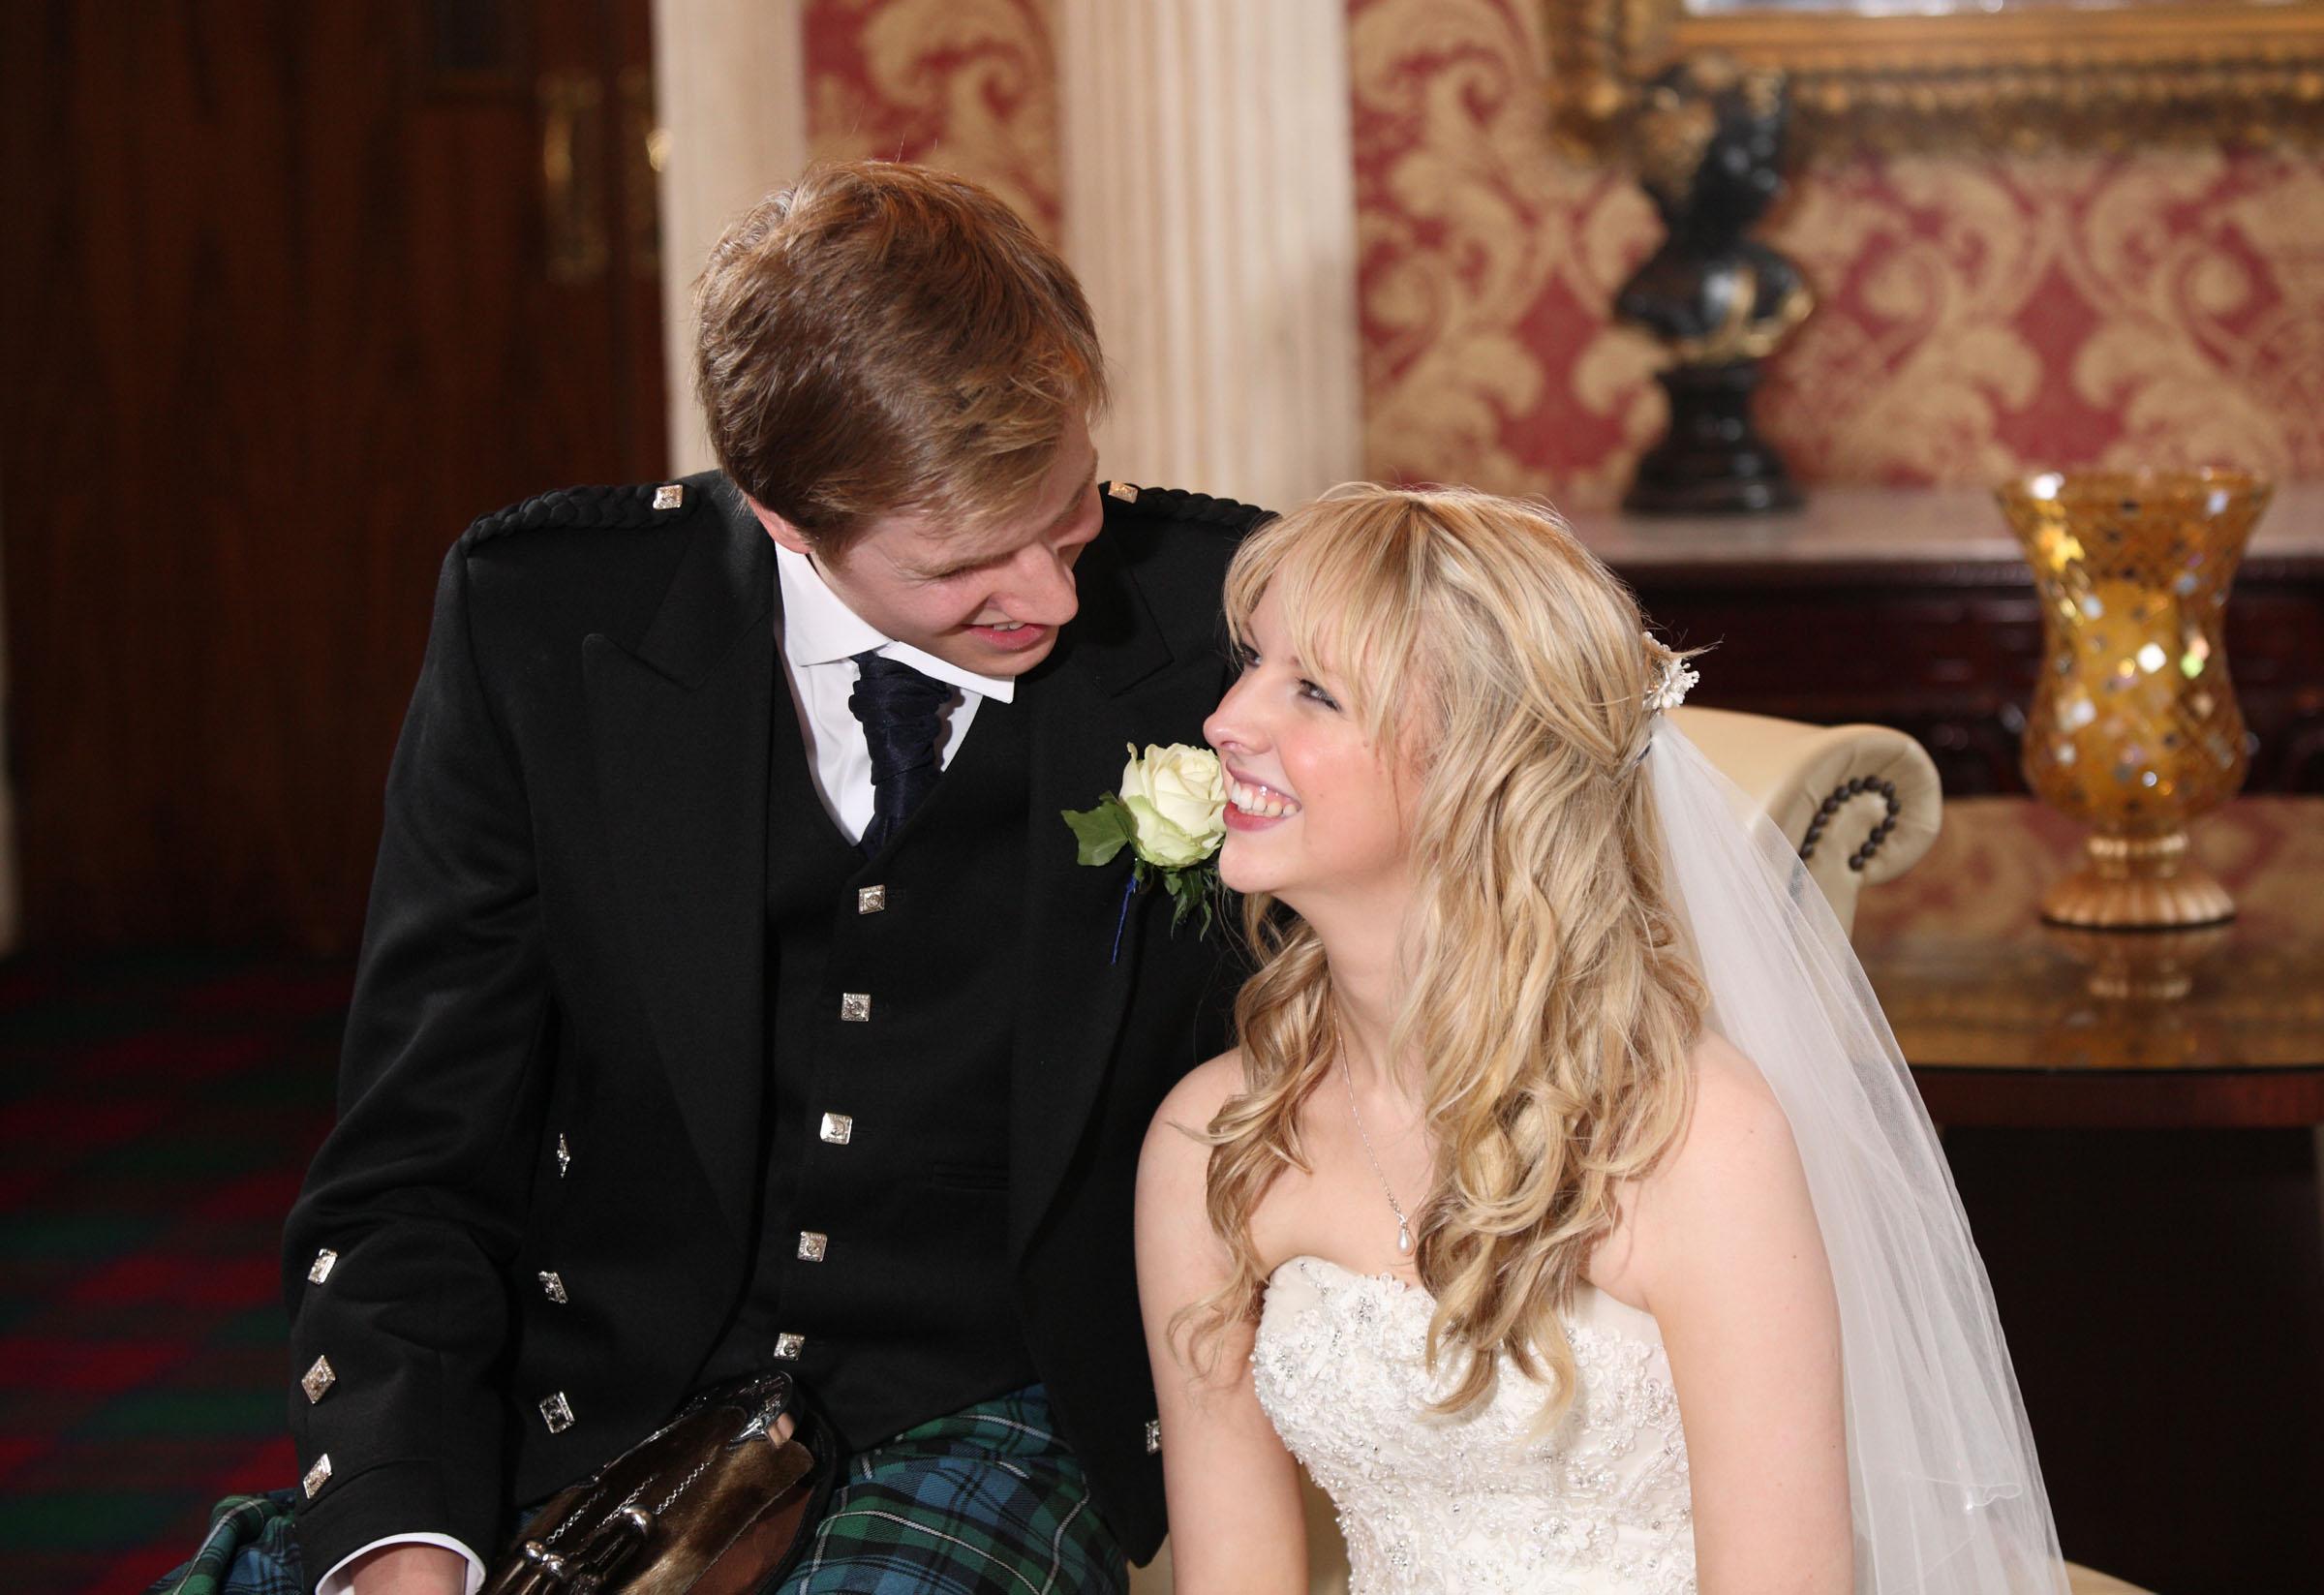 The_Look_bride&groom wedding photographer in Edinburgh .jpg